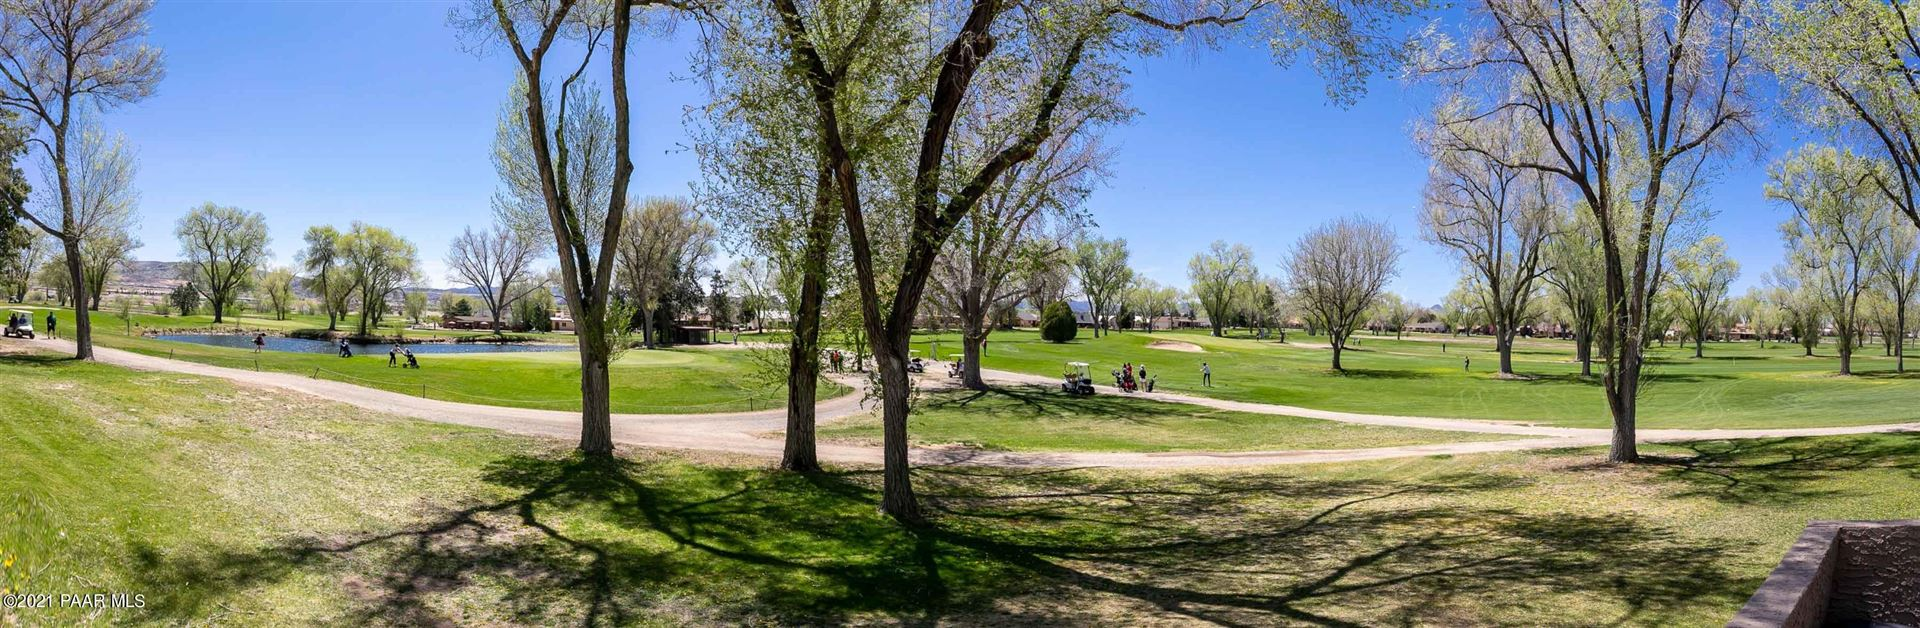 Photo of 2199 Clubhouse Drive #Lot: 23, Prescott, AZ 86301 (MLS # 1037671)